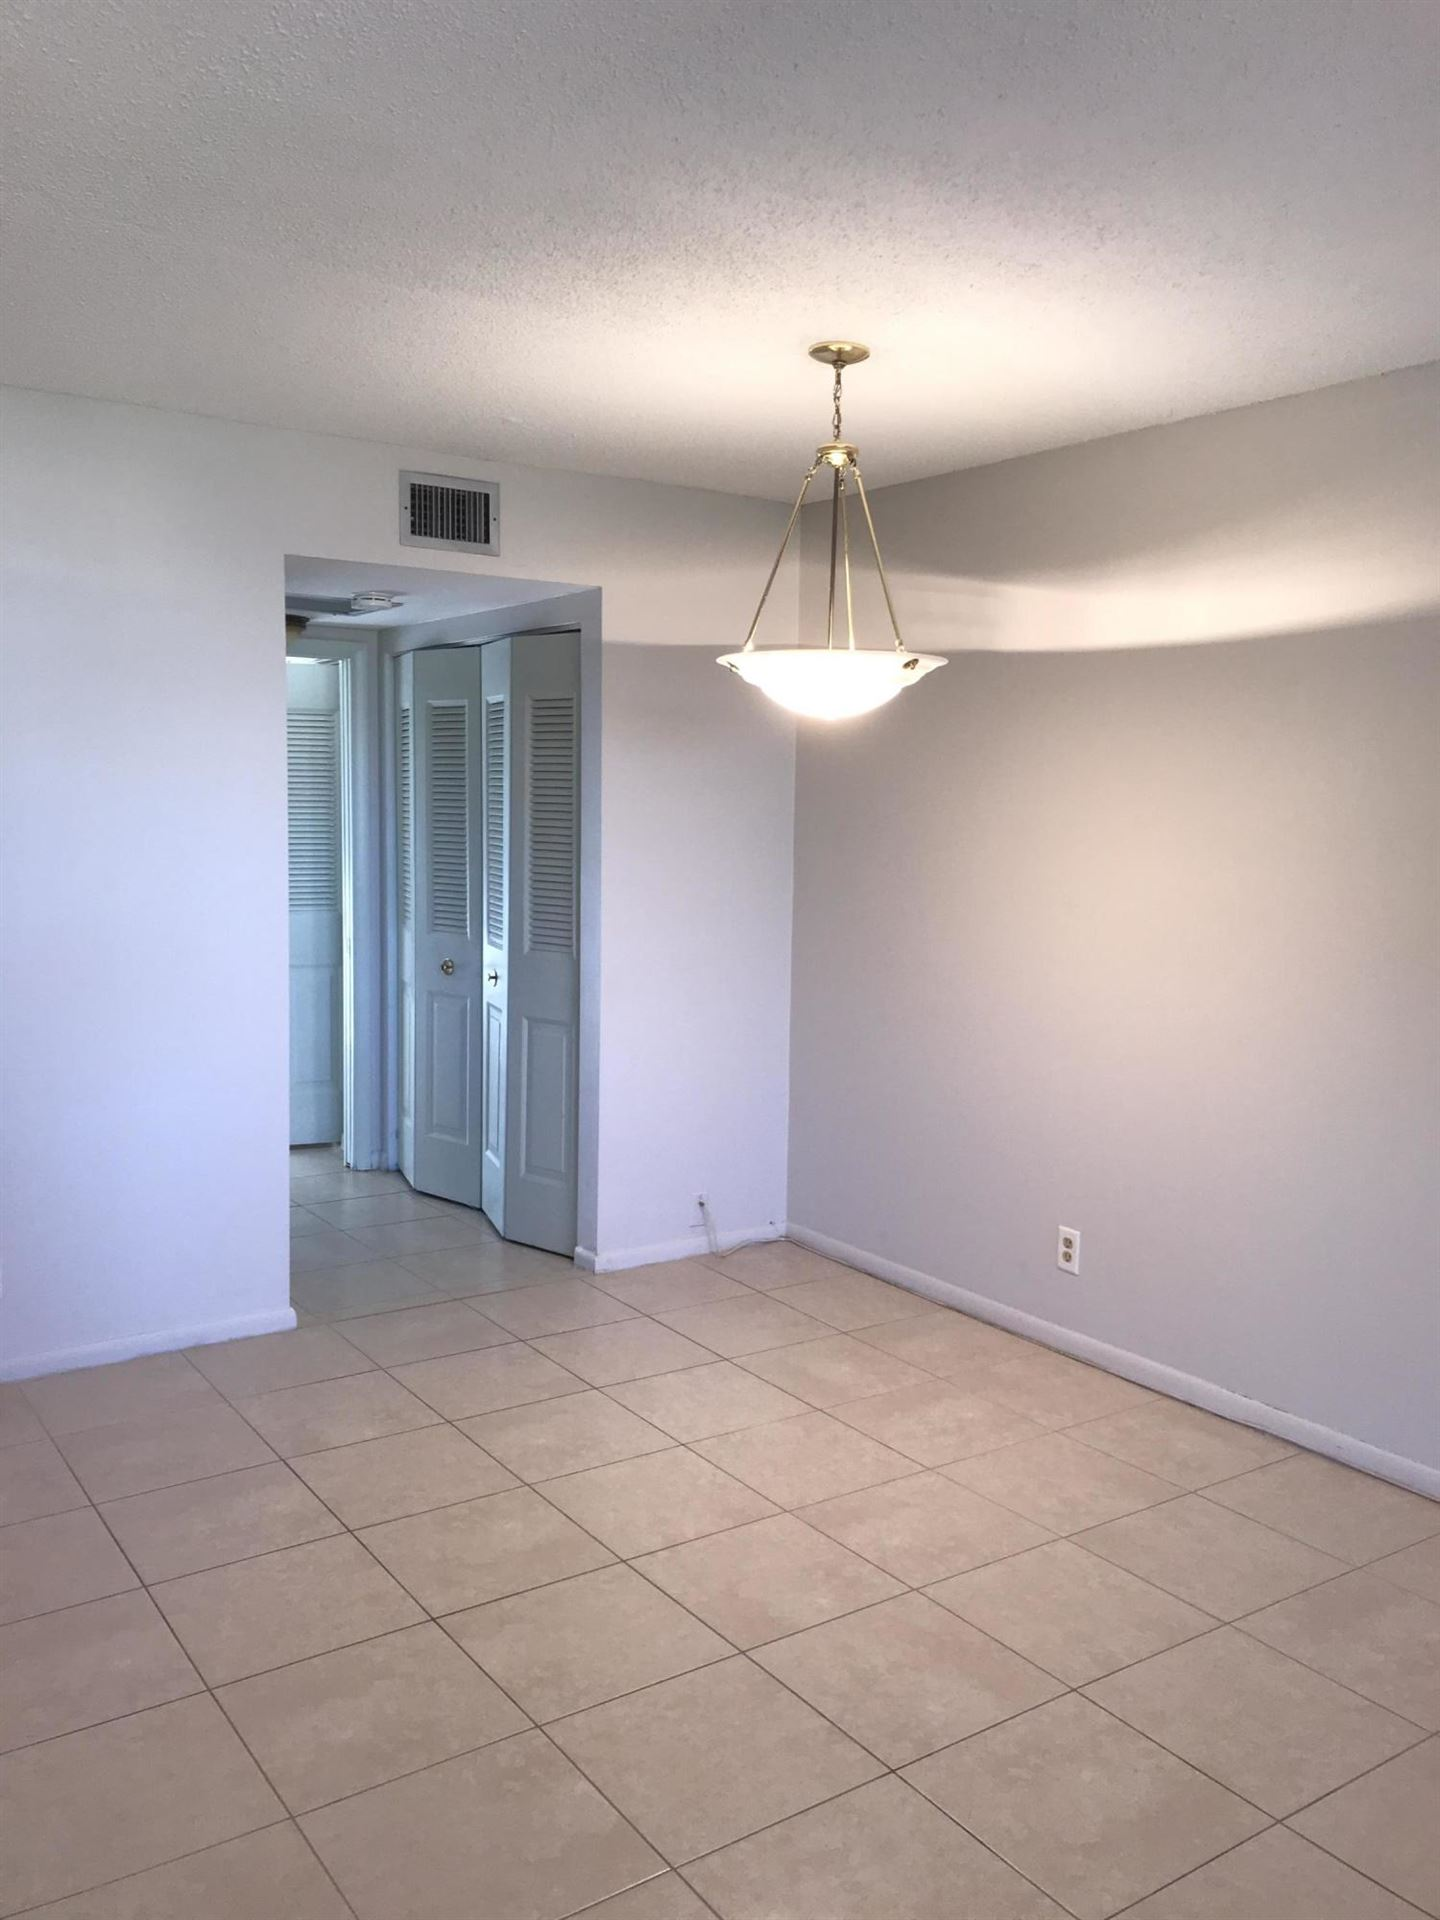 150 Hastings I #., West Palm Beach, FL 33417 - MLS#: RX-10680322